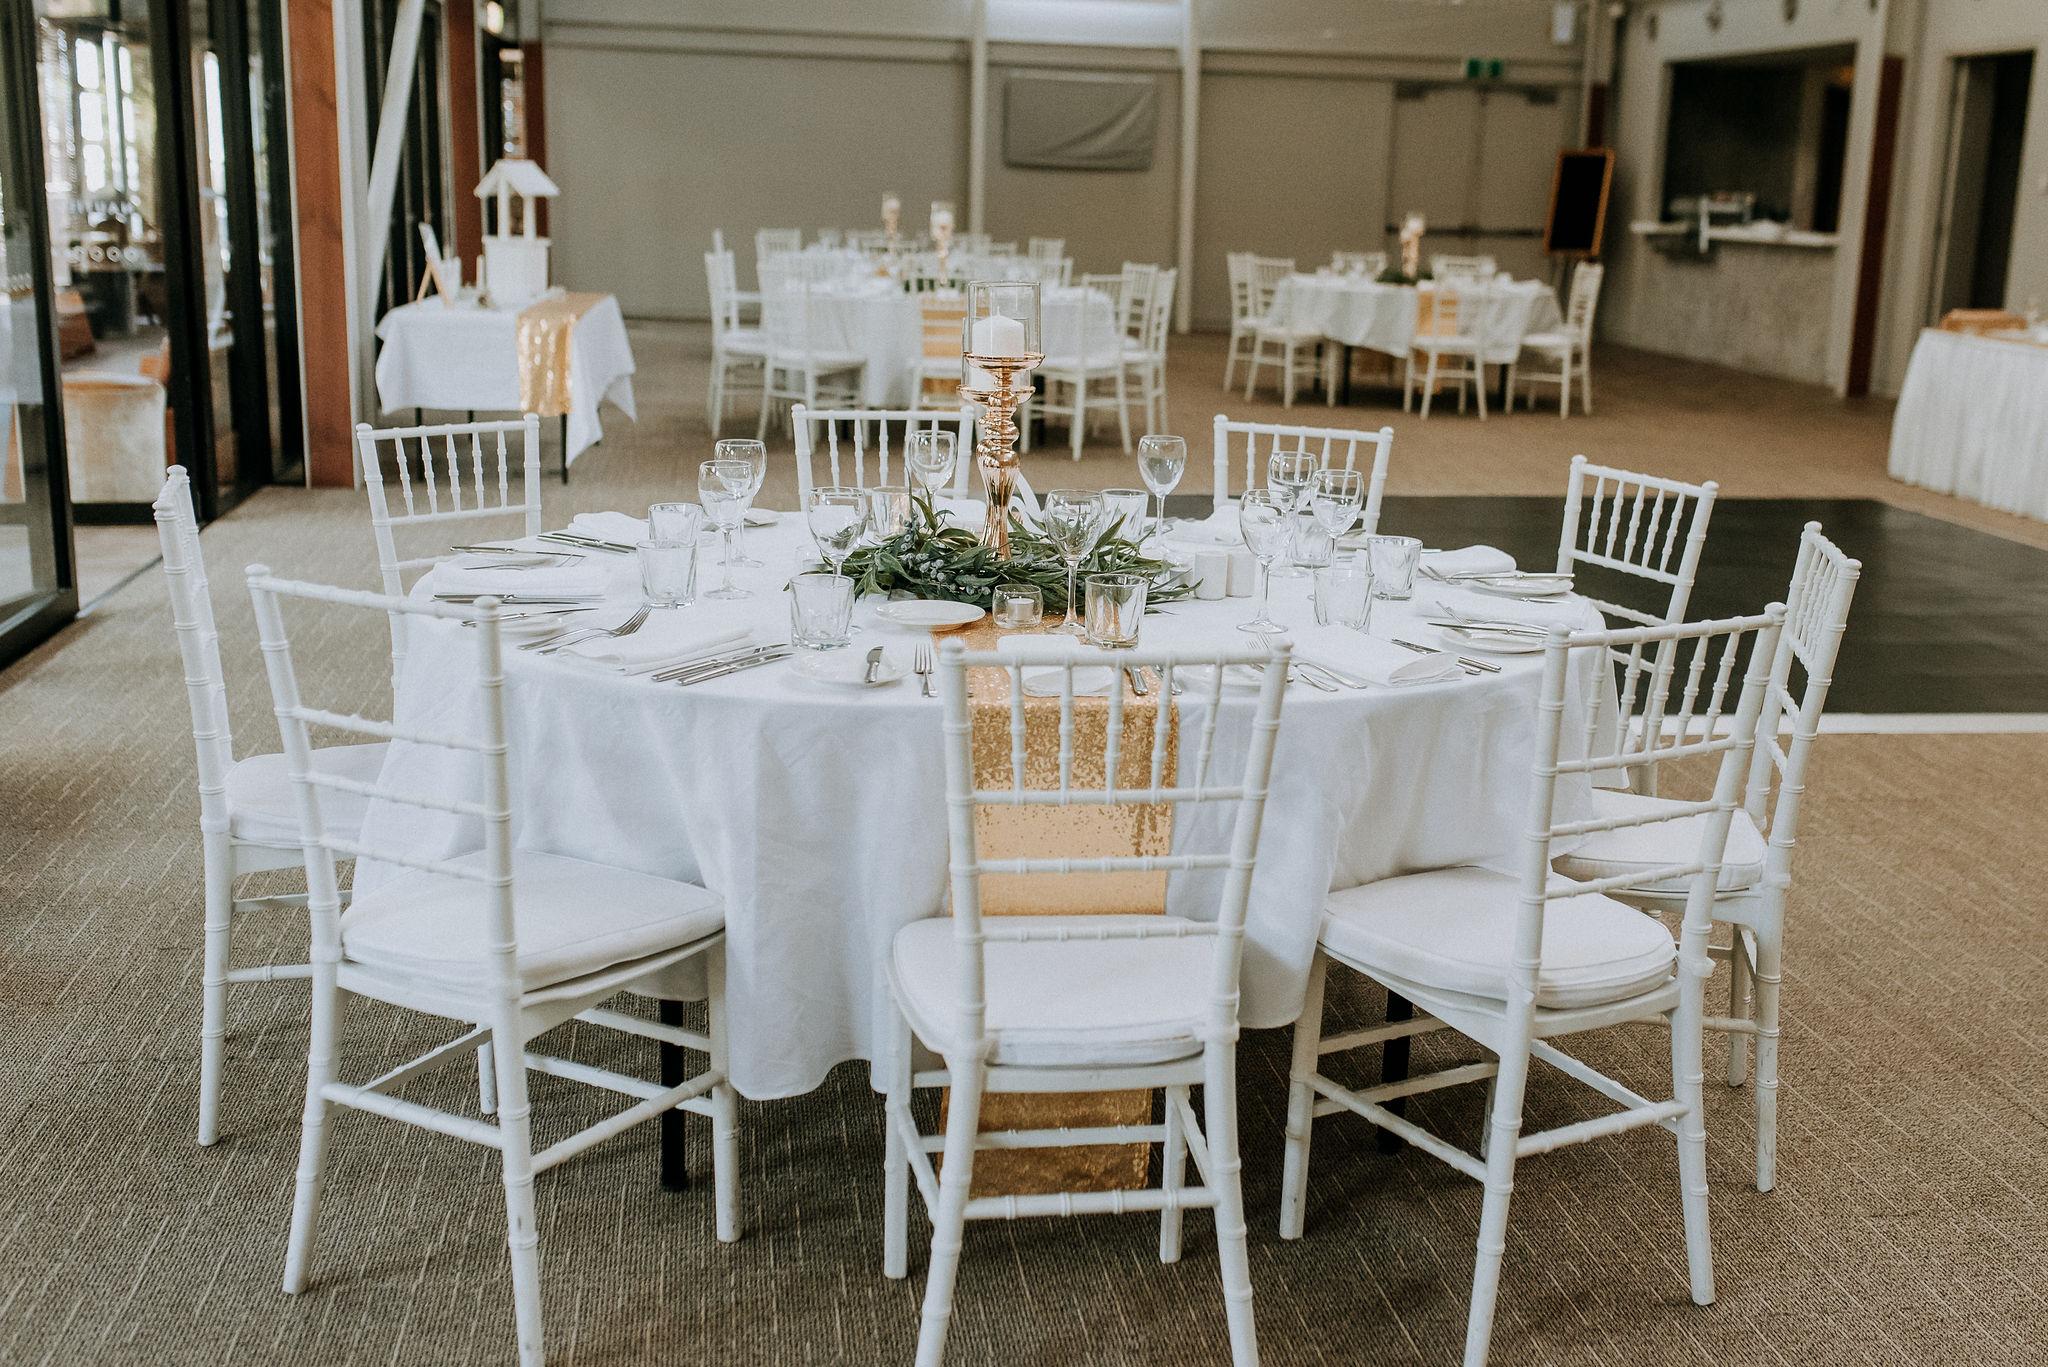 CAVES-BEACH-HOTEL-WEDDING-PATTEN-151.jpg